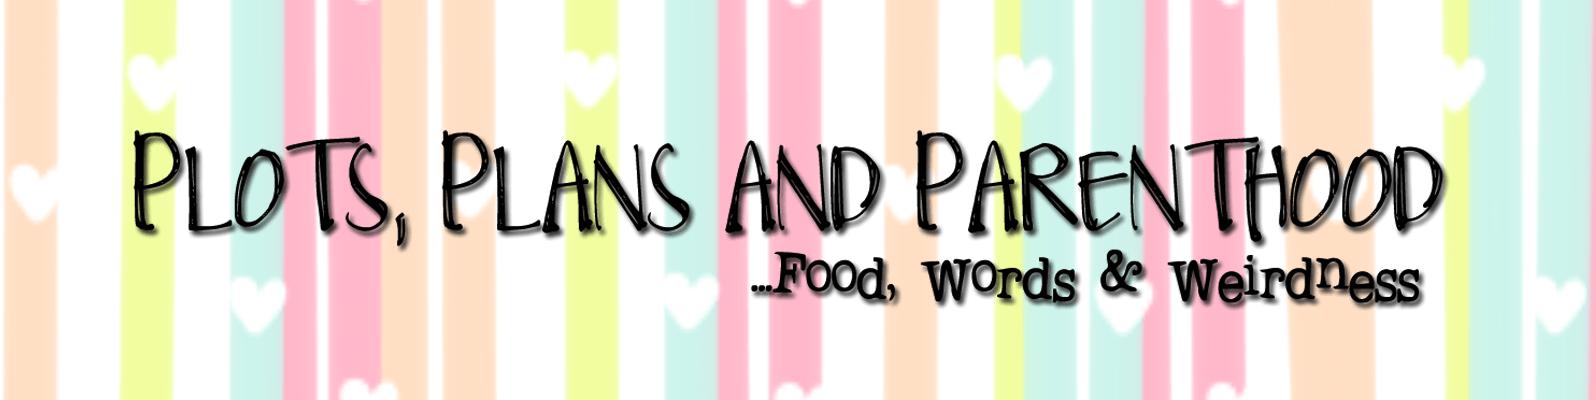 Plots Plans and Parenthood